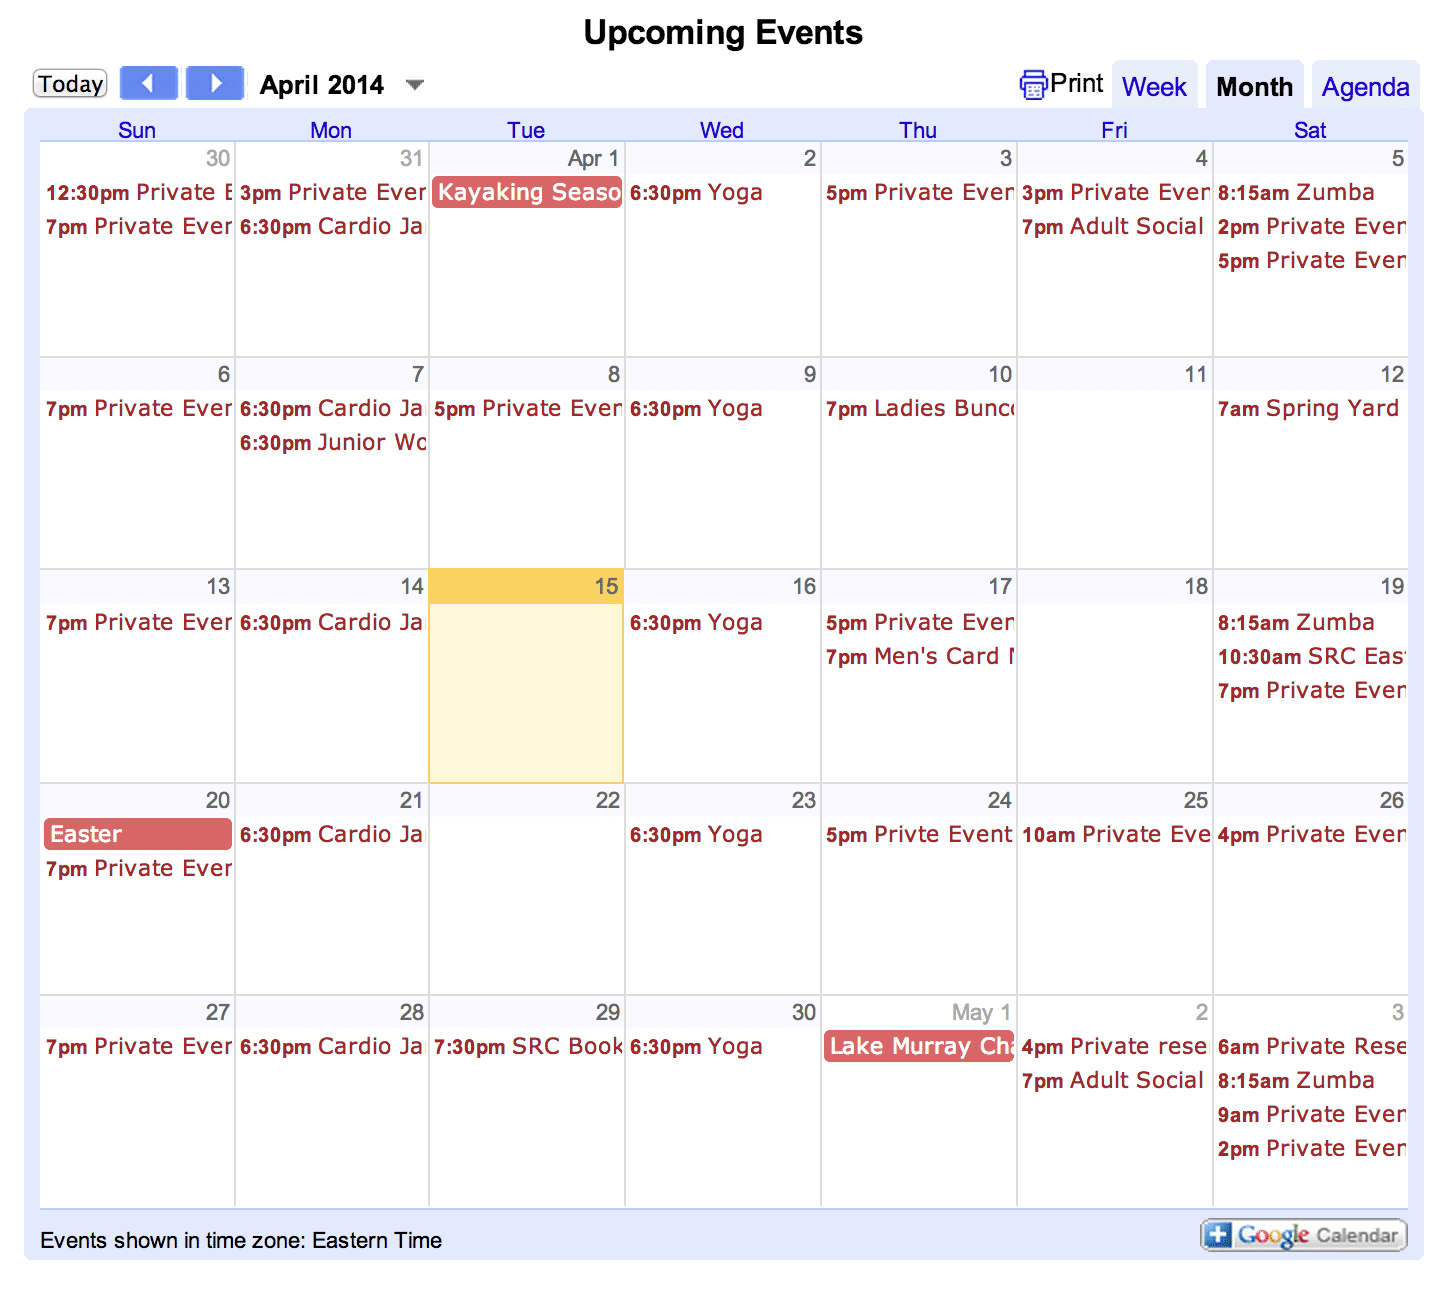 April activities at Saluda River Club